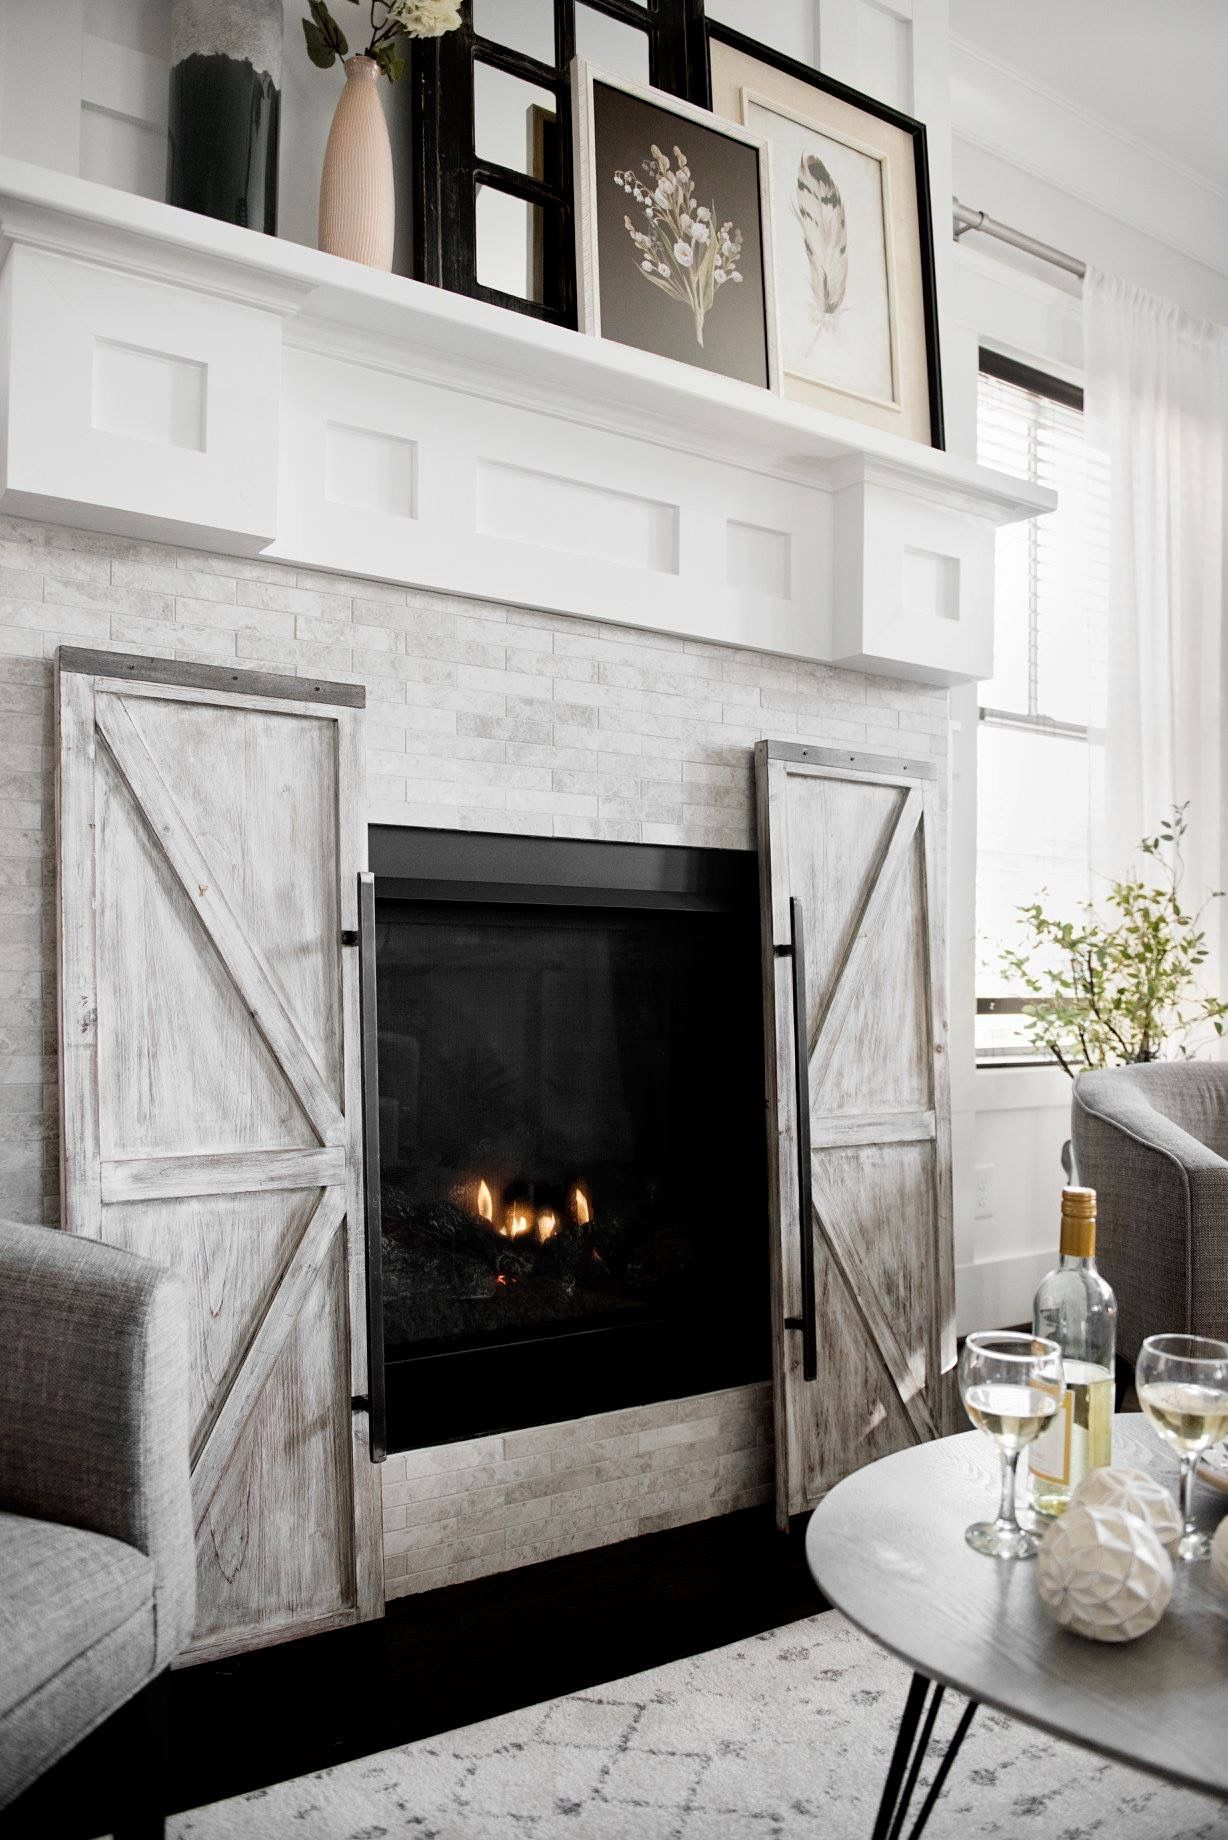 Kirkland home decor by Patti Alva on Home   Home, Gray ...